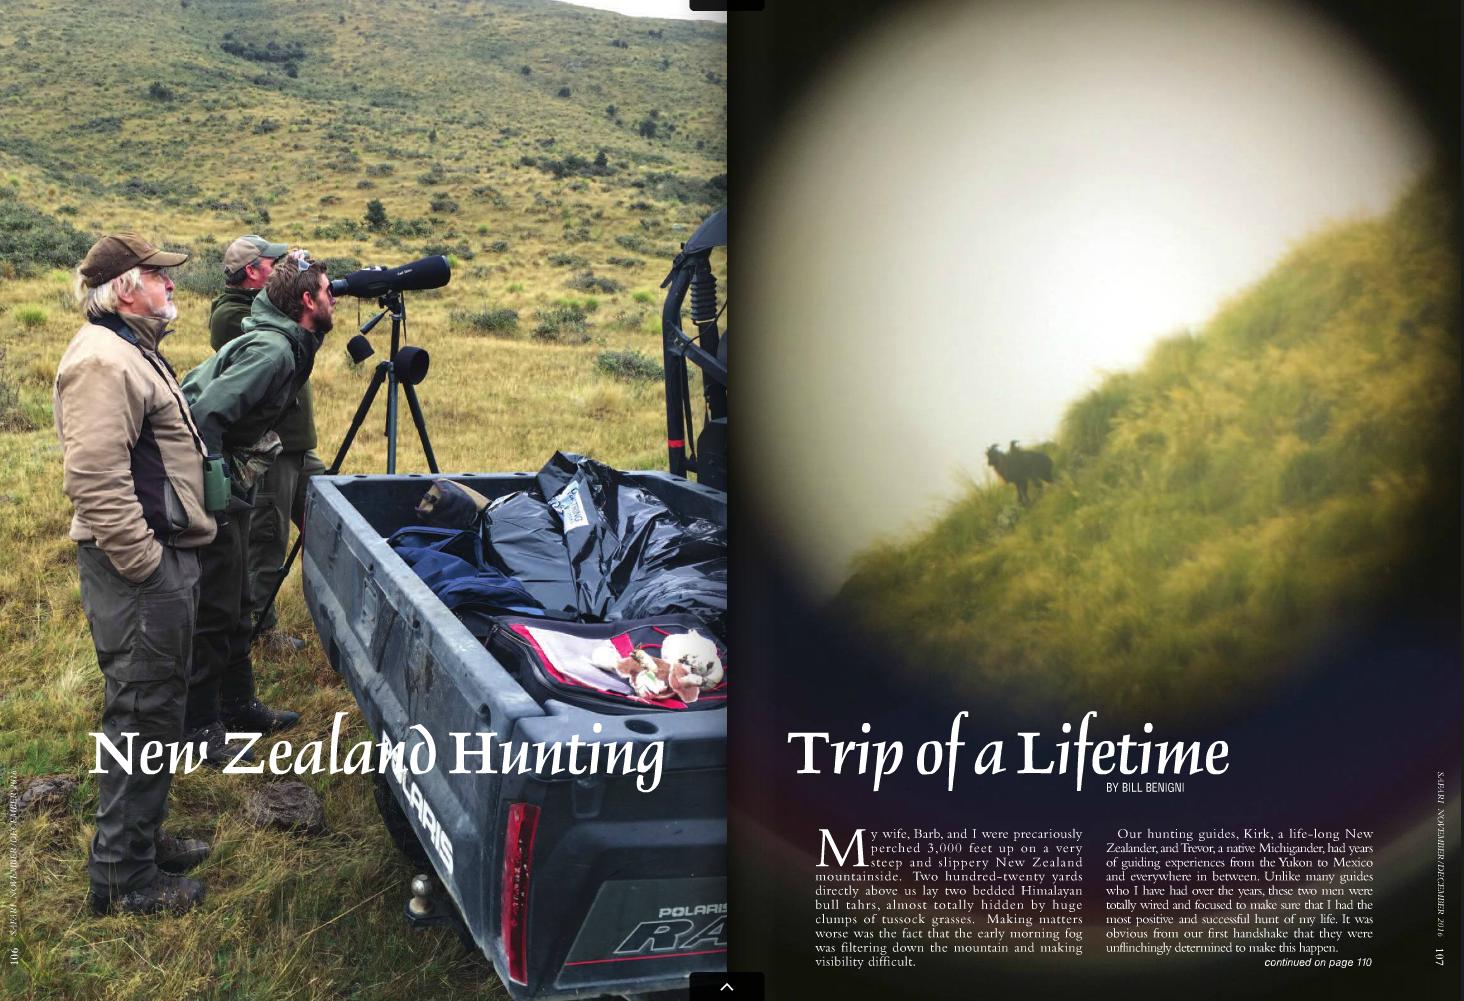 Bill's article in the Nov/Dec 2016 Safari magazine - the official publication of Safari Club International